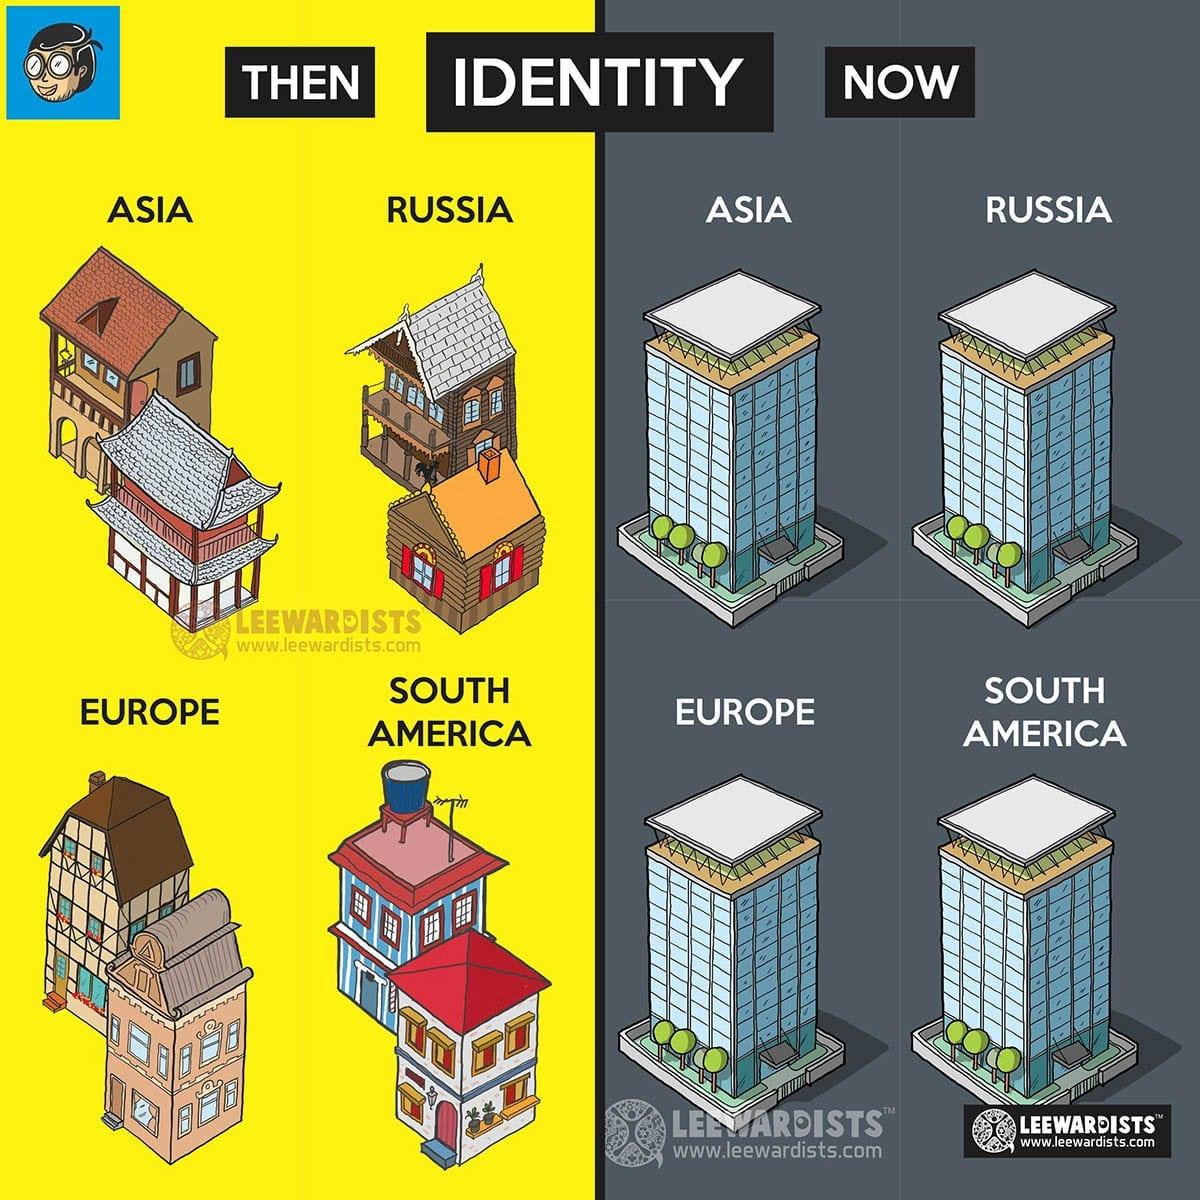 identityofarchitecture-1-